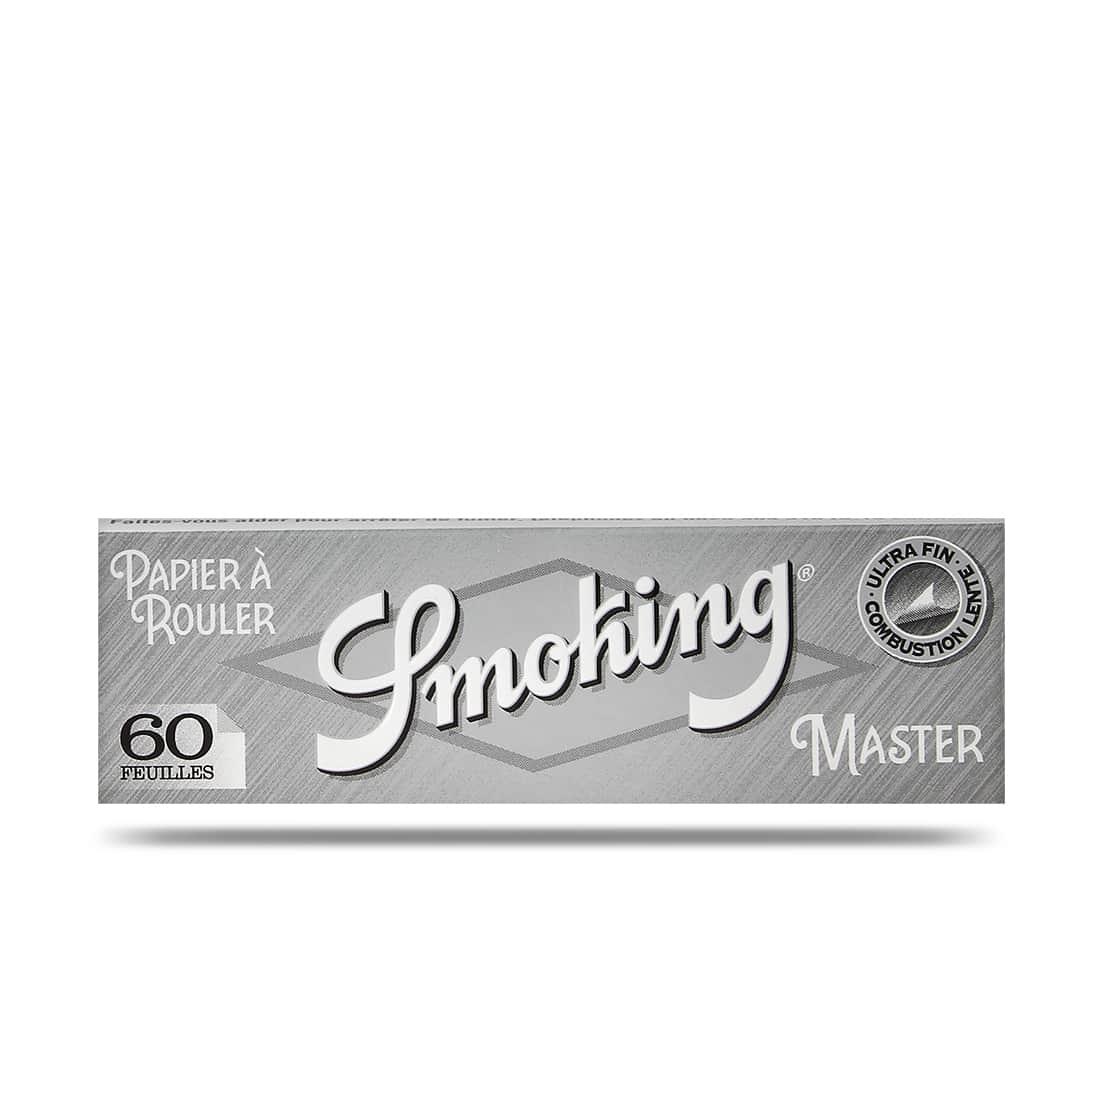 Photo #1 de Pack Découverte Feuille a rouler Smoking Regular